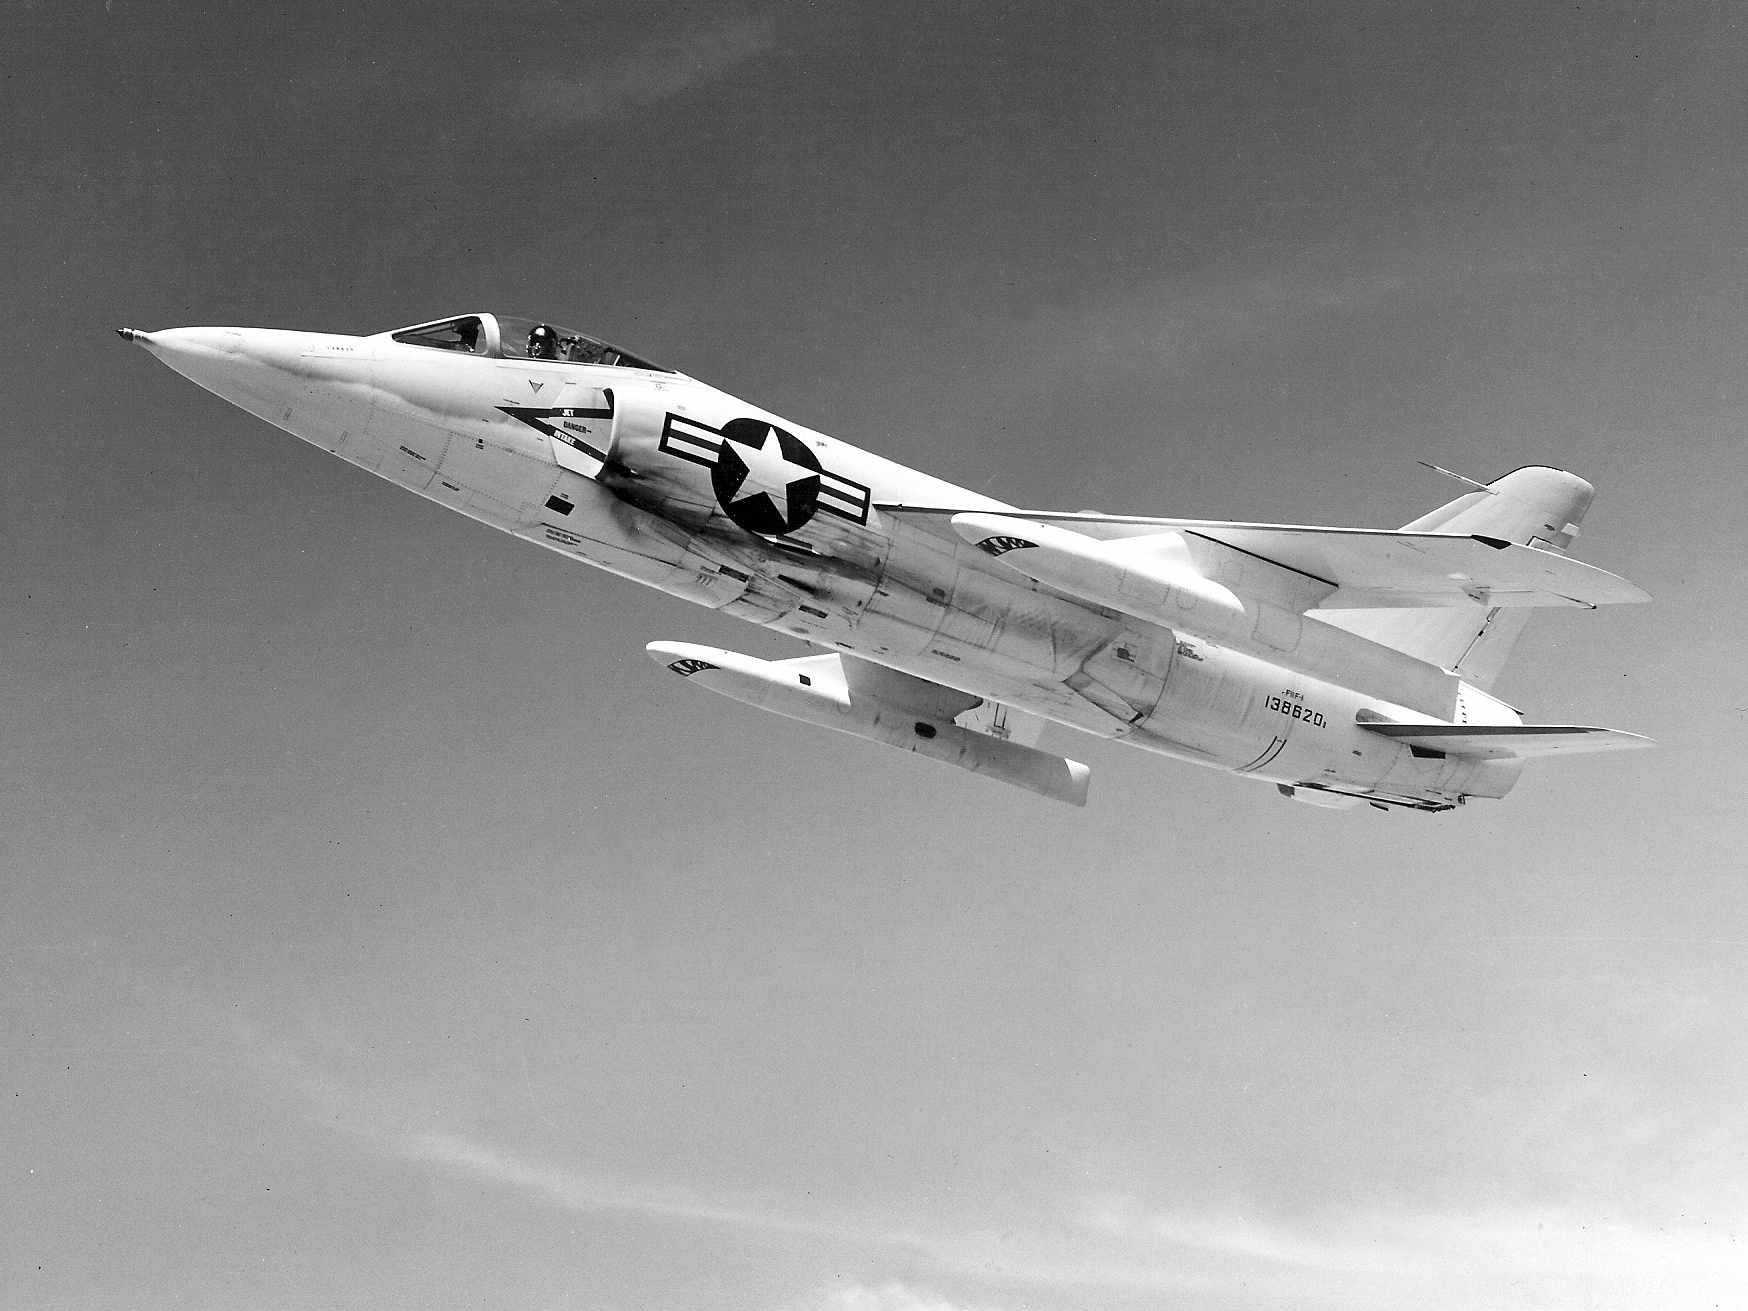 Opinions on Grumman F-11 Tiger